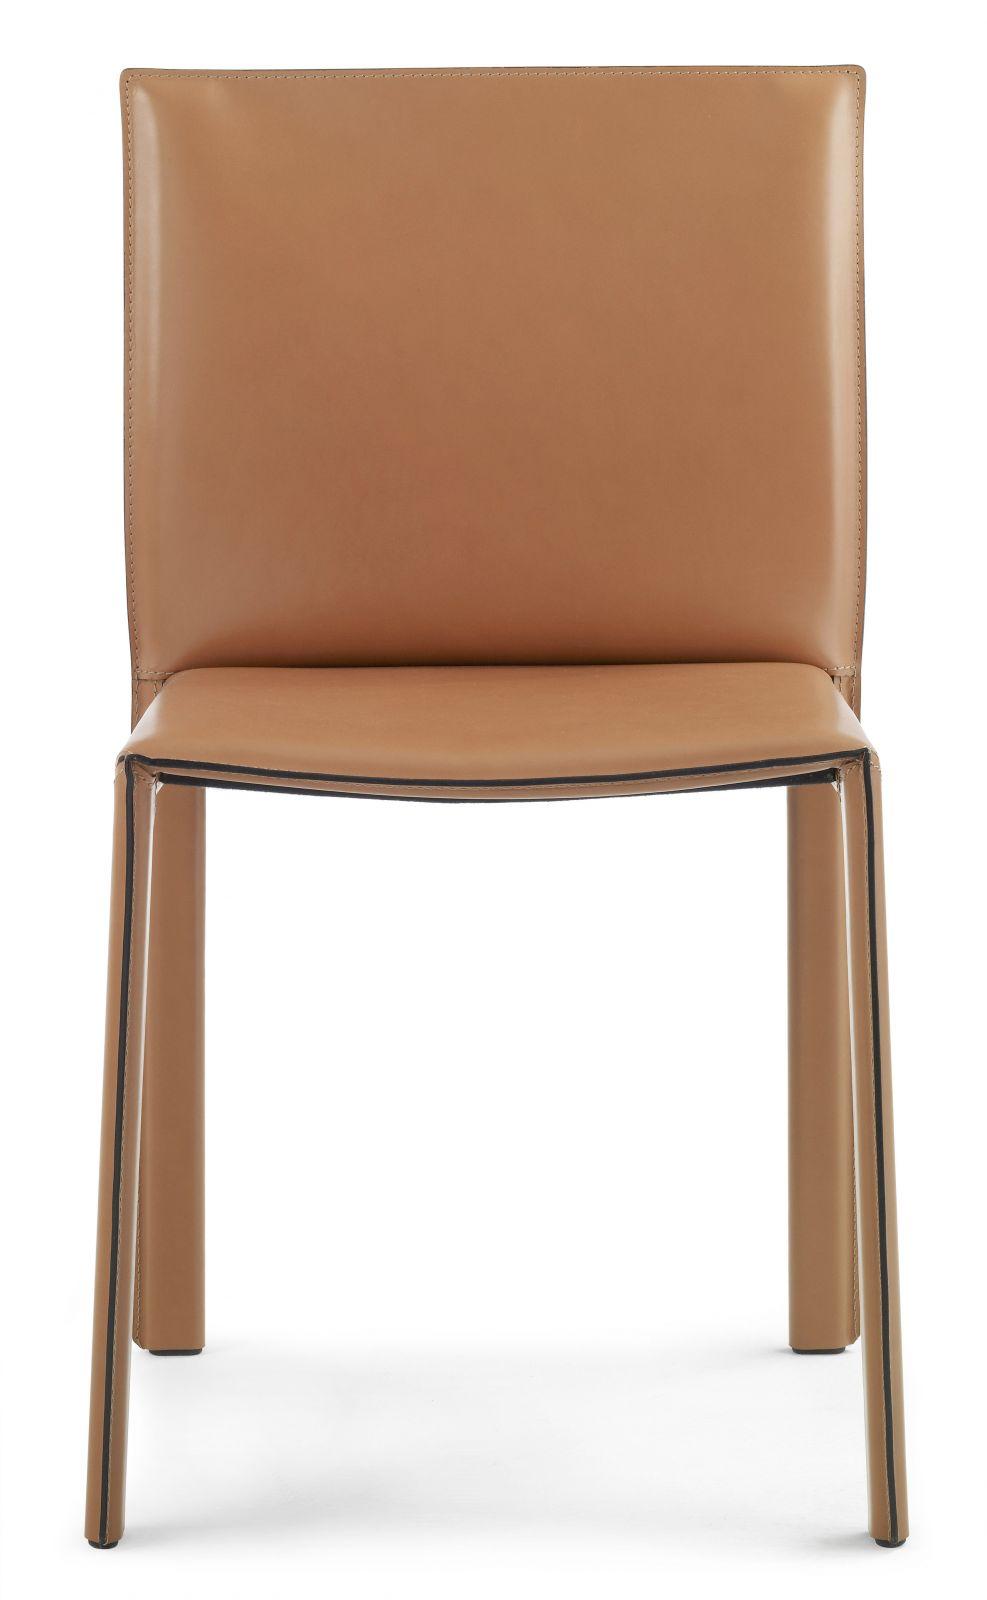 modern-office-furniture-chairs-Italian-designer-furniture (29).jpg